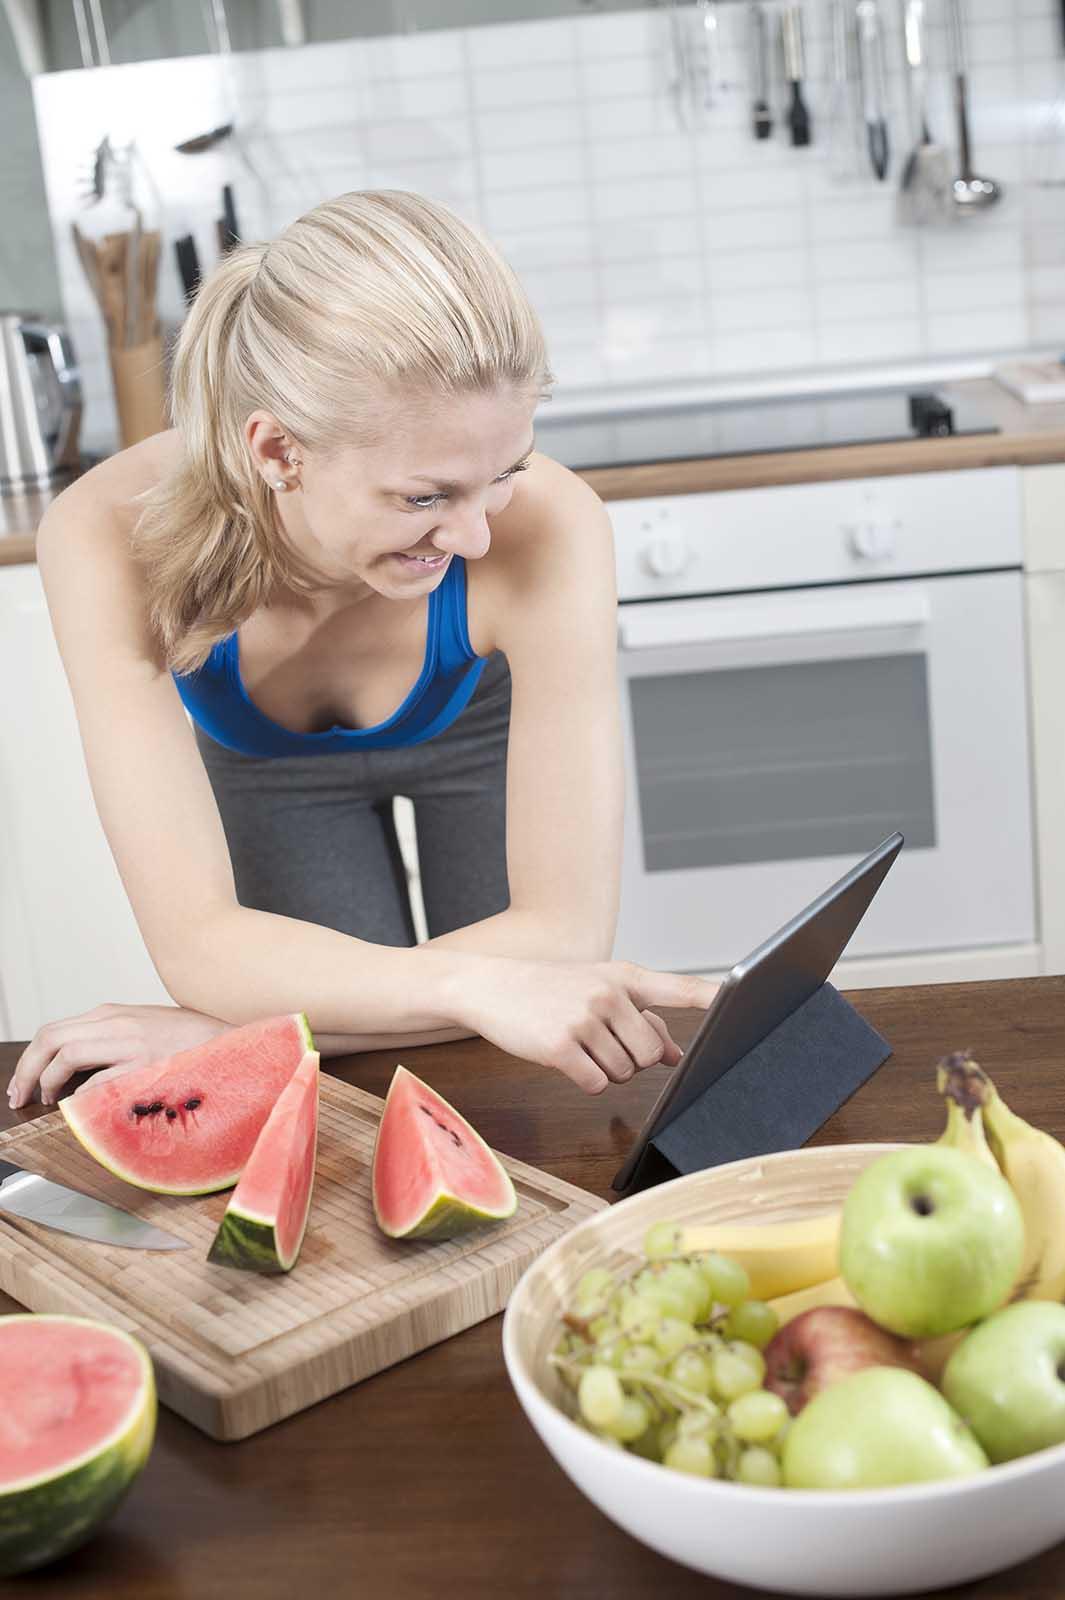 Junge Frau sucht Rezept online auf I Pad in Kueche